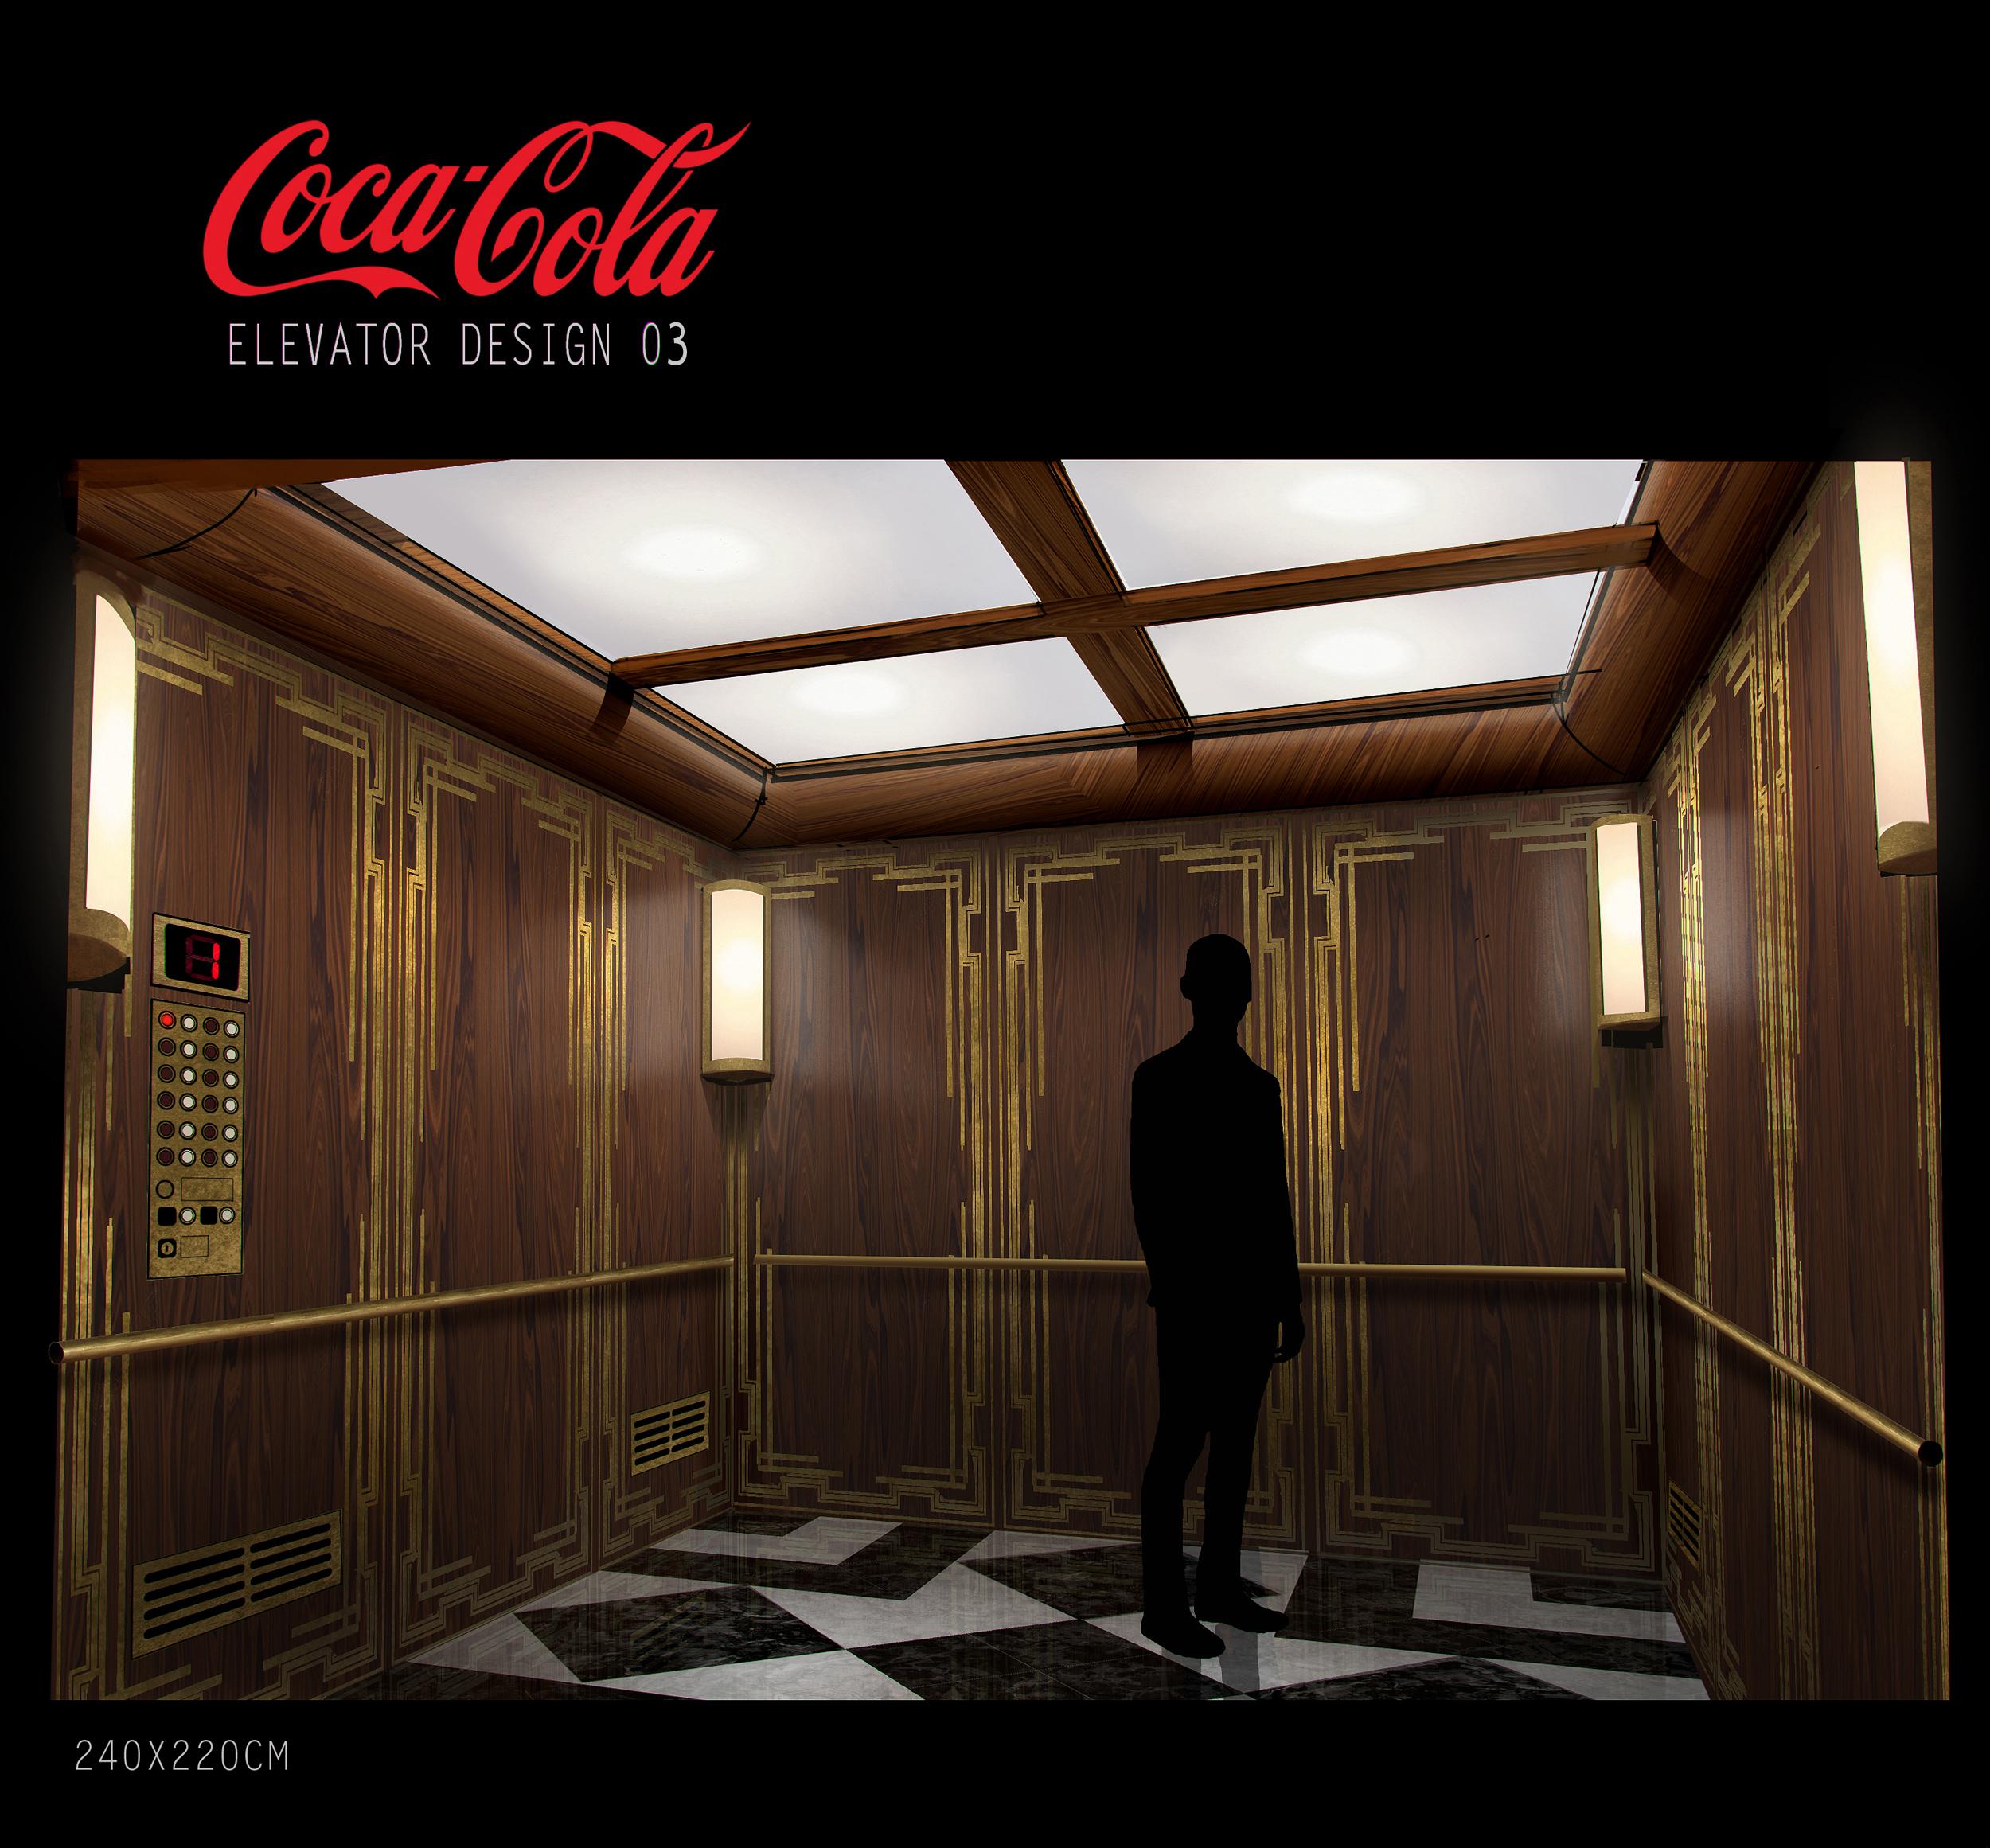 CocacolaElevator03.jpg